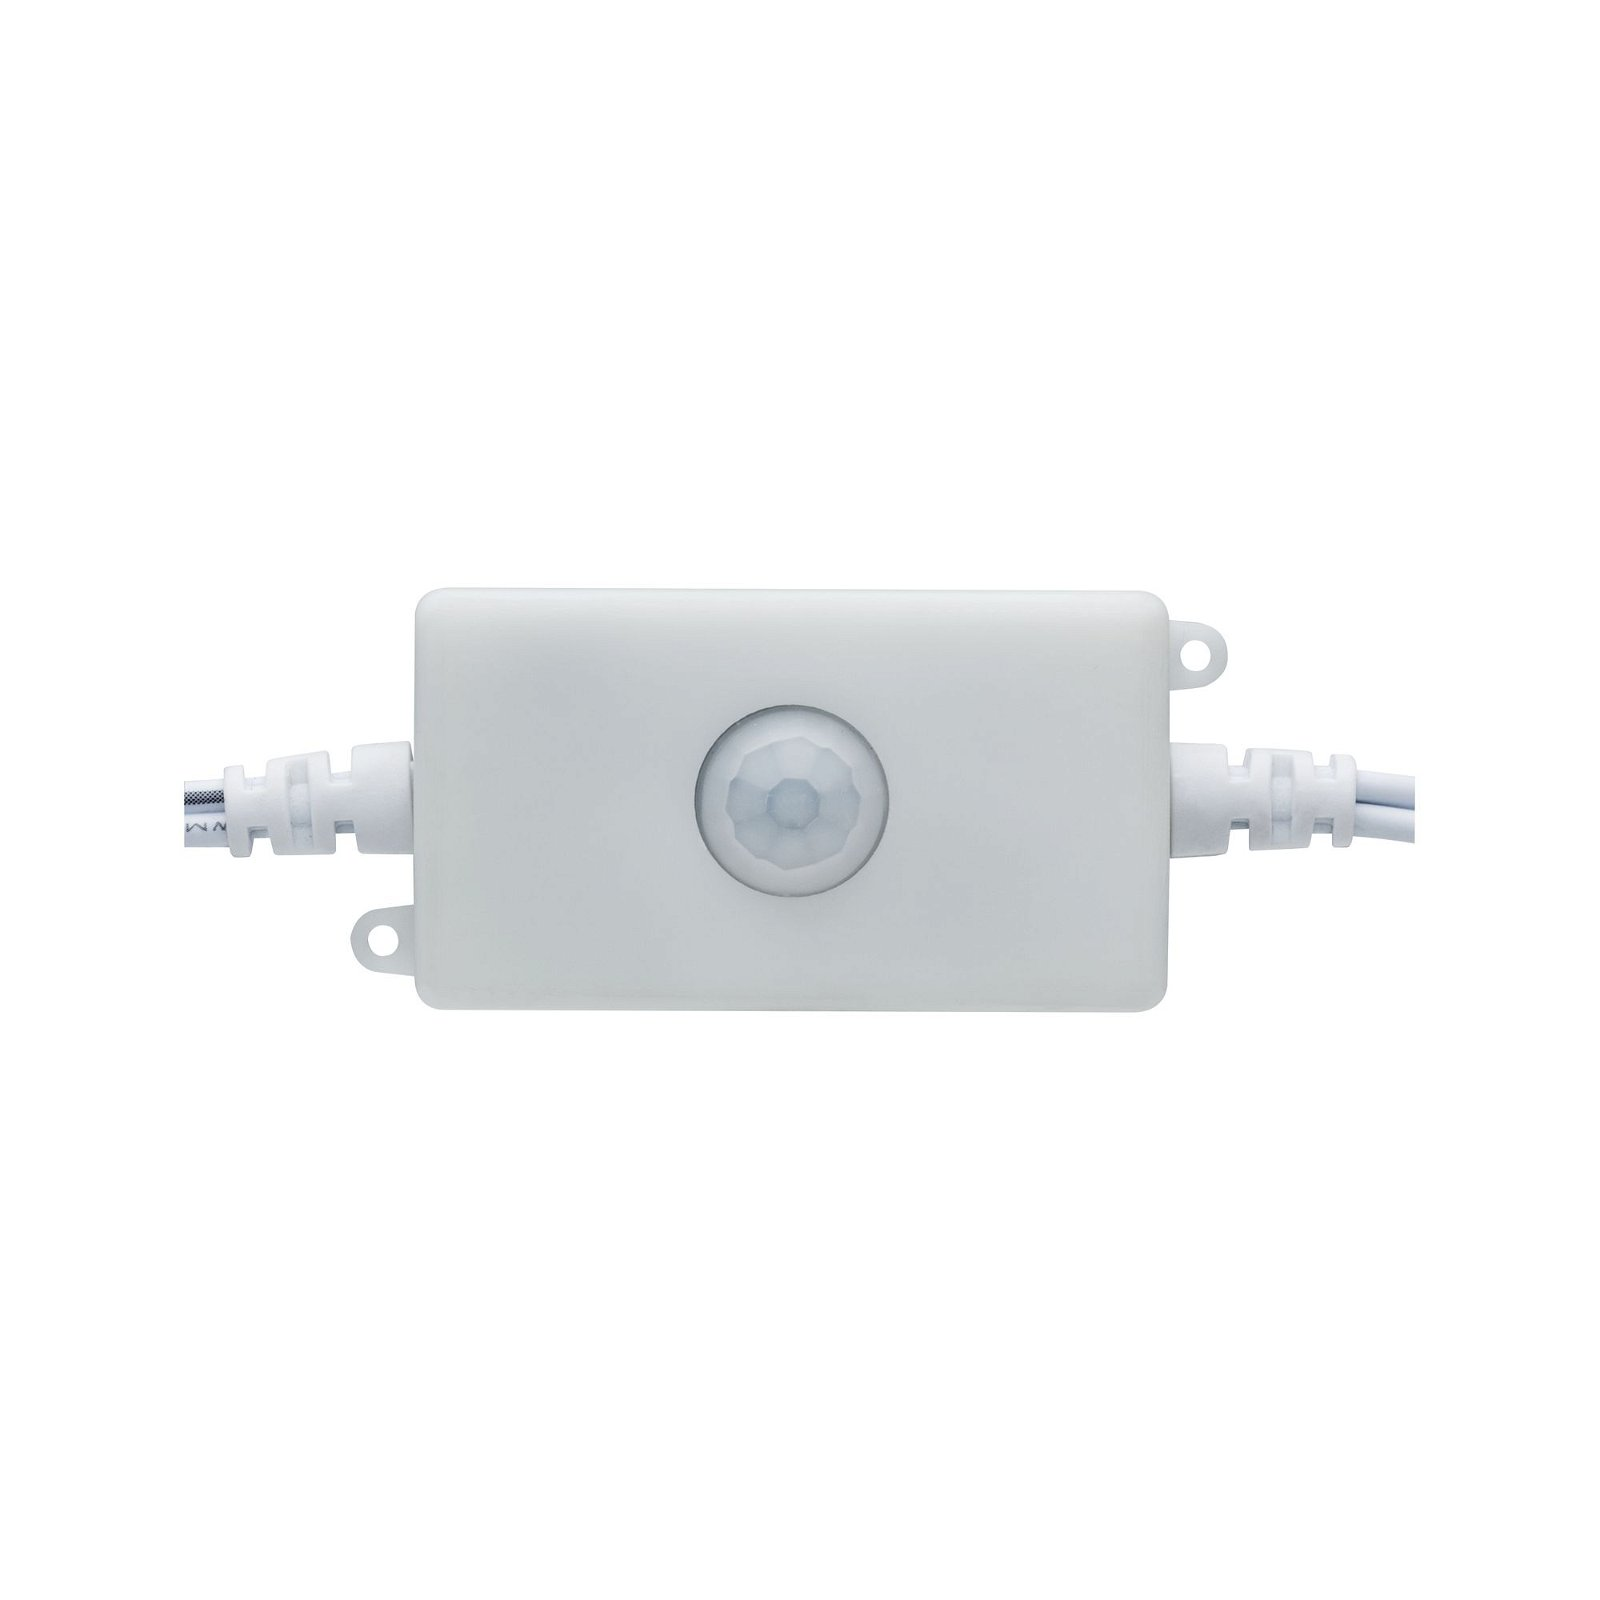 YourLED Sensor DC 12V max. 60W Weiß